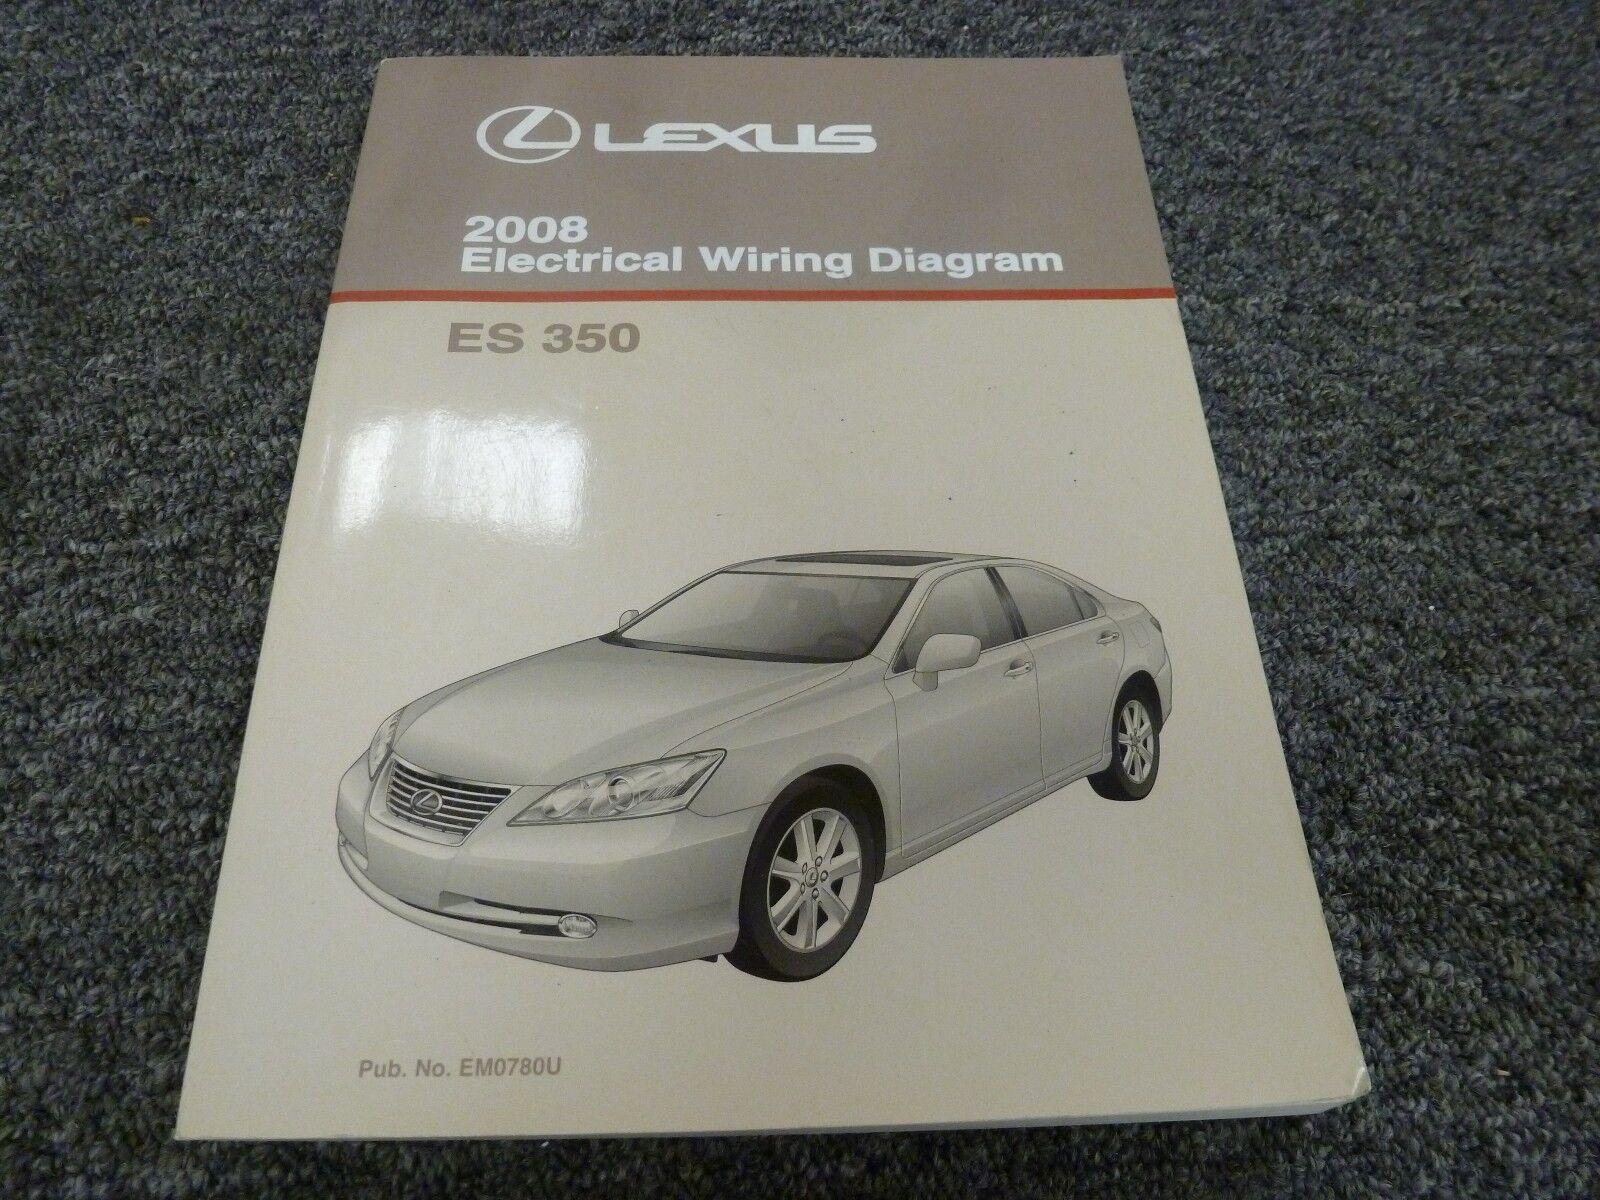 Sensational Lexus Es 350 Sedan Electrical Wiring Manual 3 5L V6 Fwd 2008 Diagram Wiring Cloud Hisonuggs Outletorg